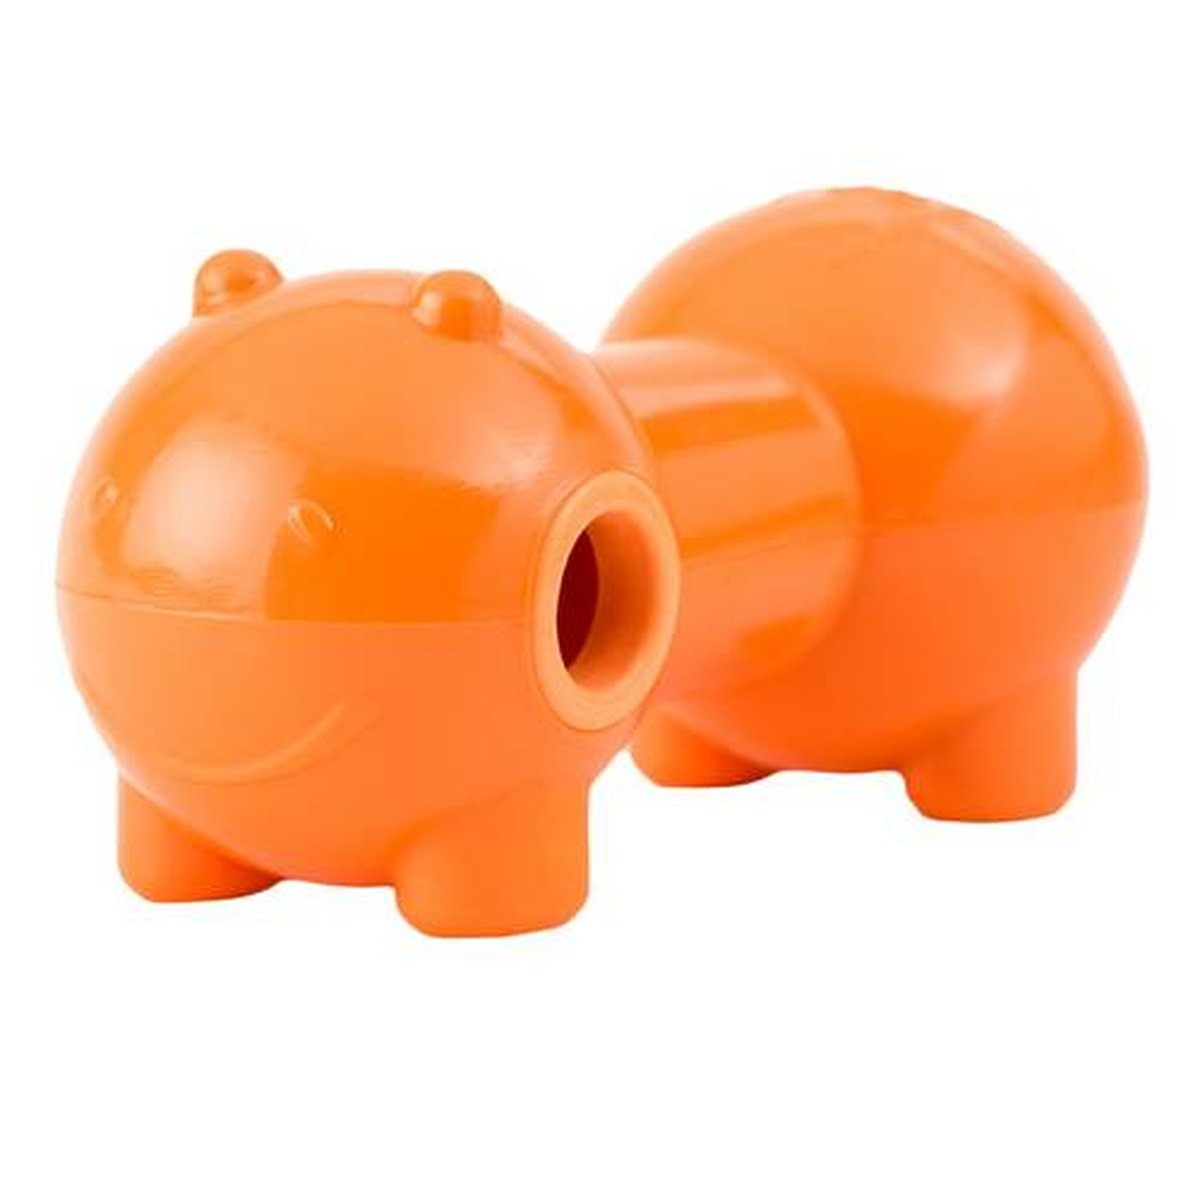 Afbeelding van Beba Toy Medium Orange 1 st